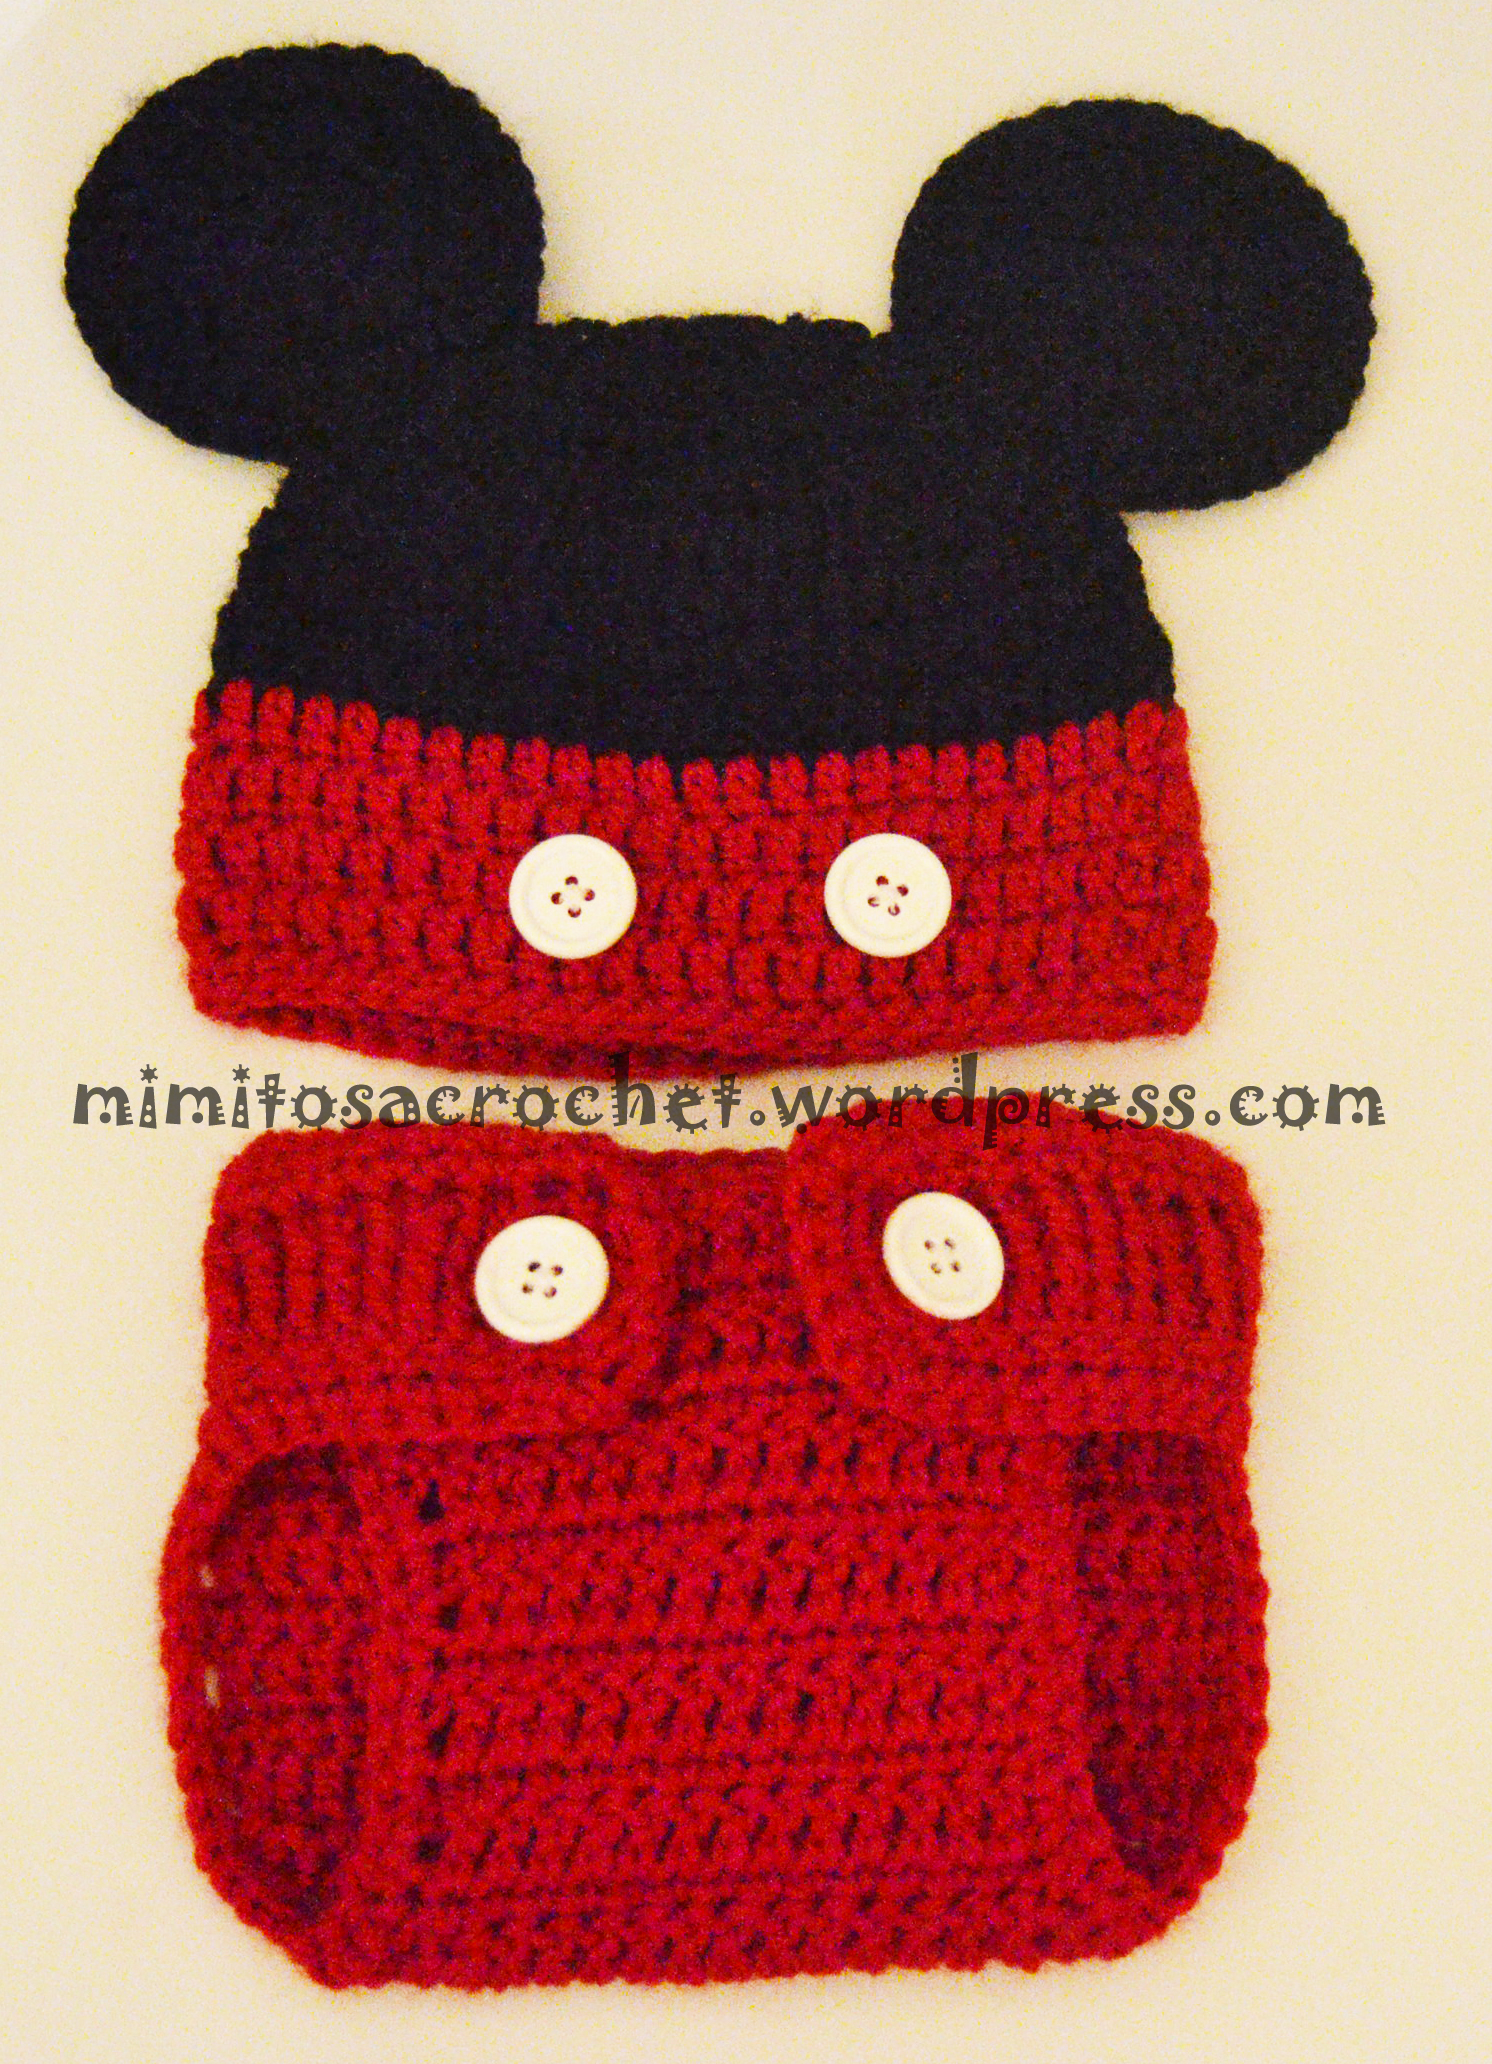 Mickey – Mimitos a Crochet